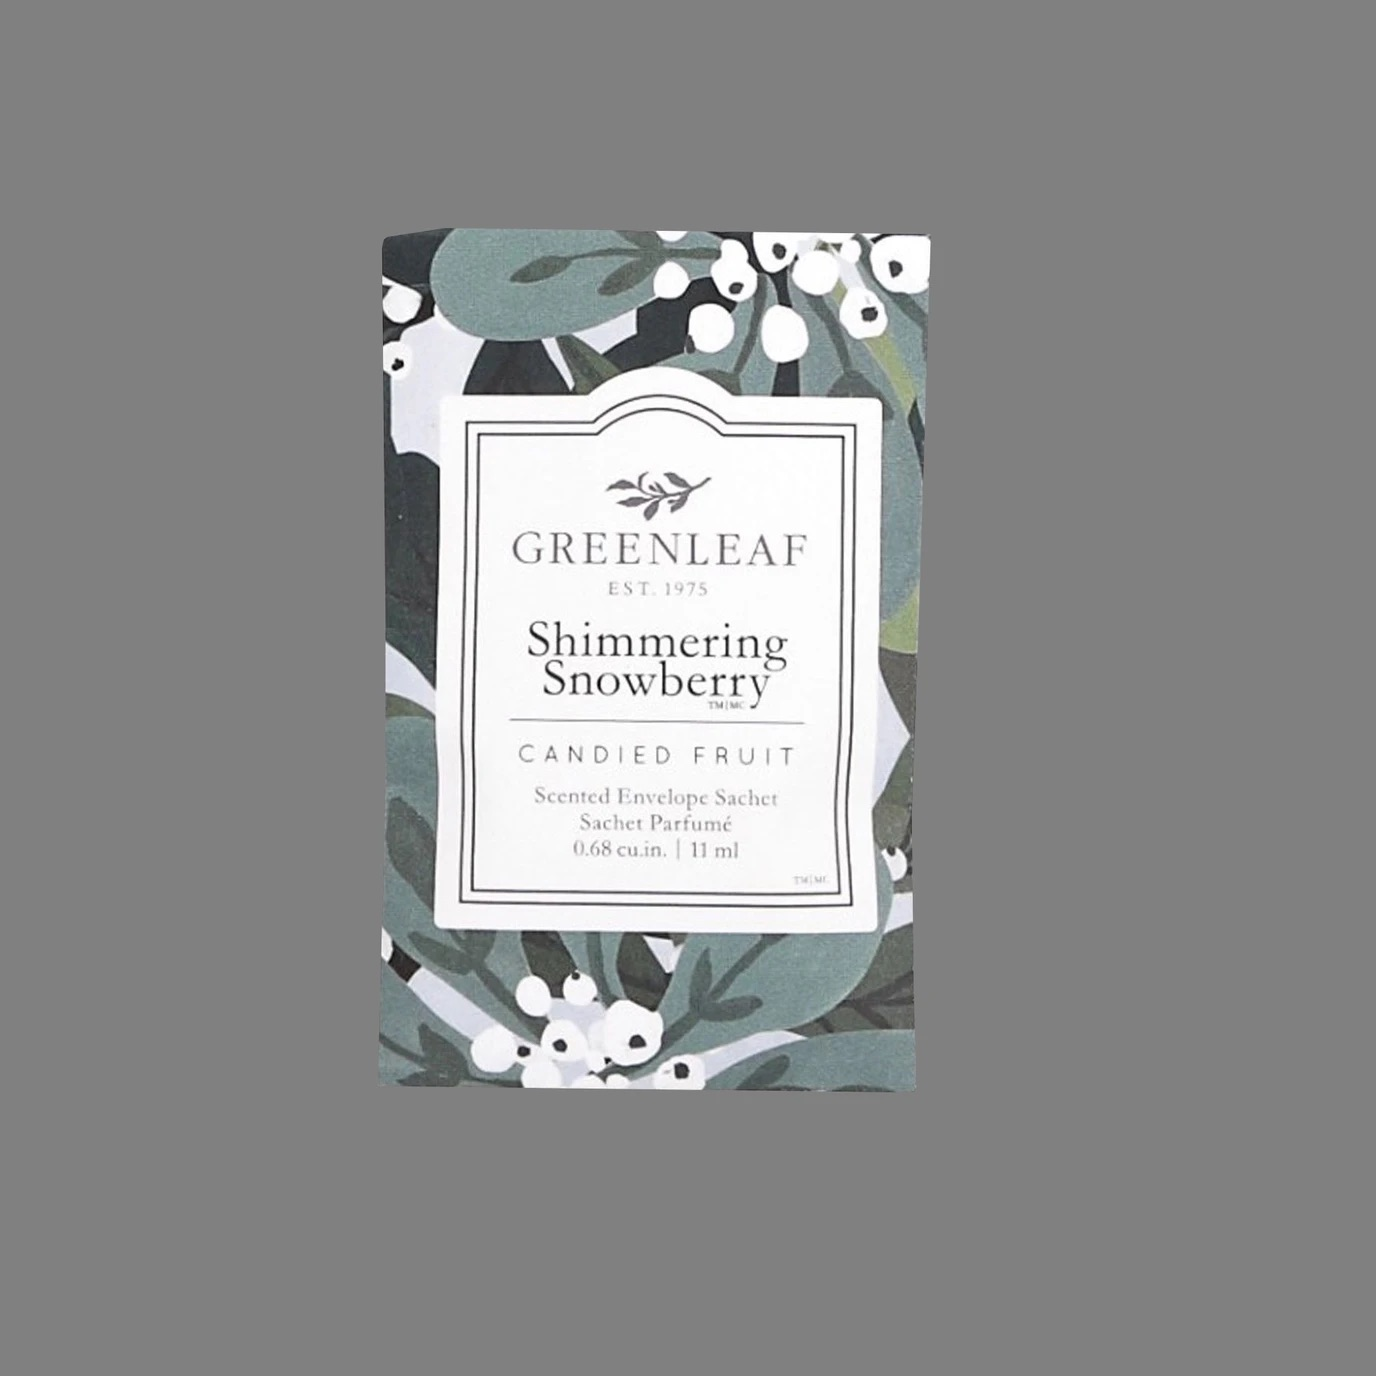 Doftpåse Shimmering Snowberry